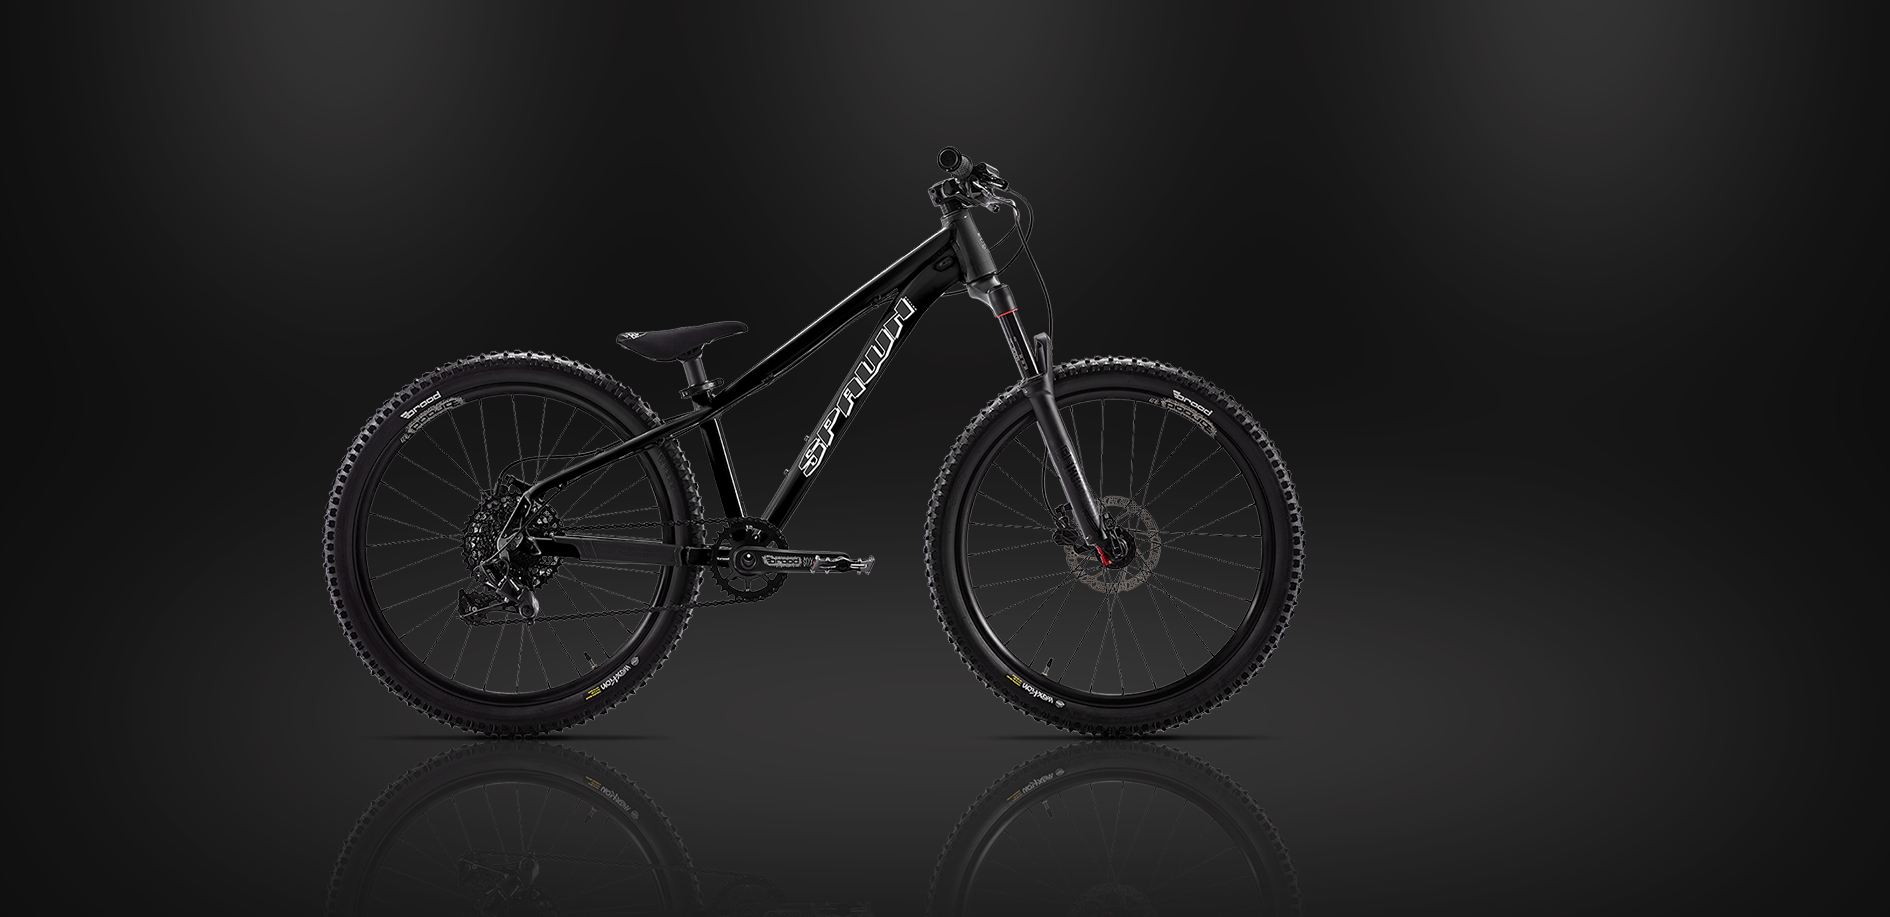 https://spawncycles.com/media/catalog/product/y/j/yj_24_-_black.png